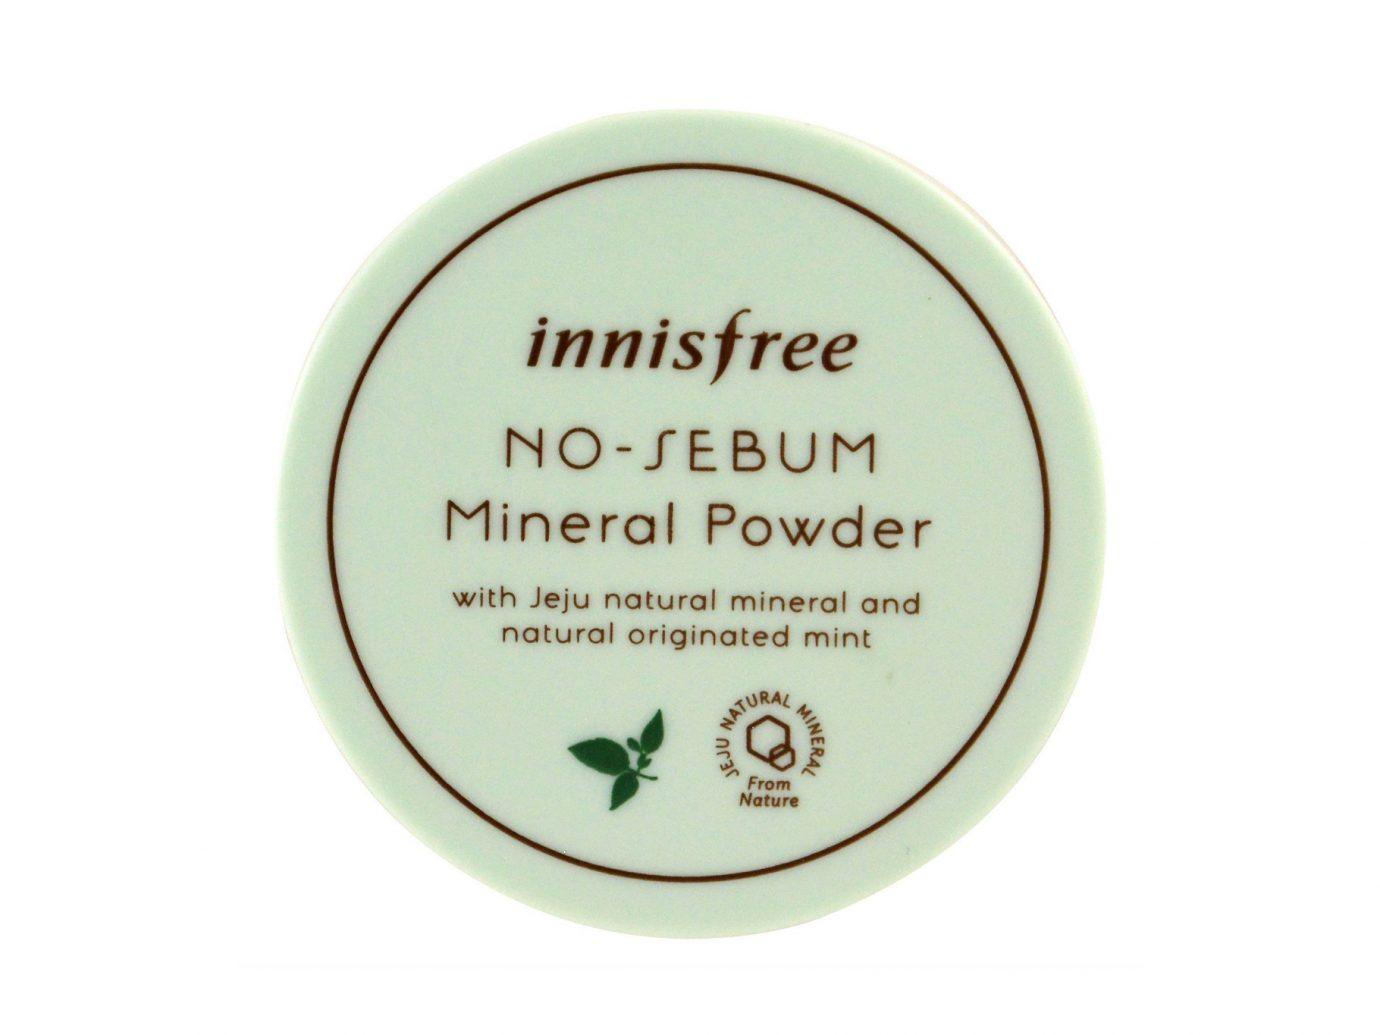 Korean beauty product Innisfree No-Sebum Mineral Powder